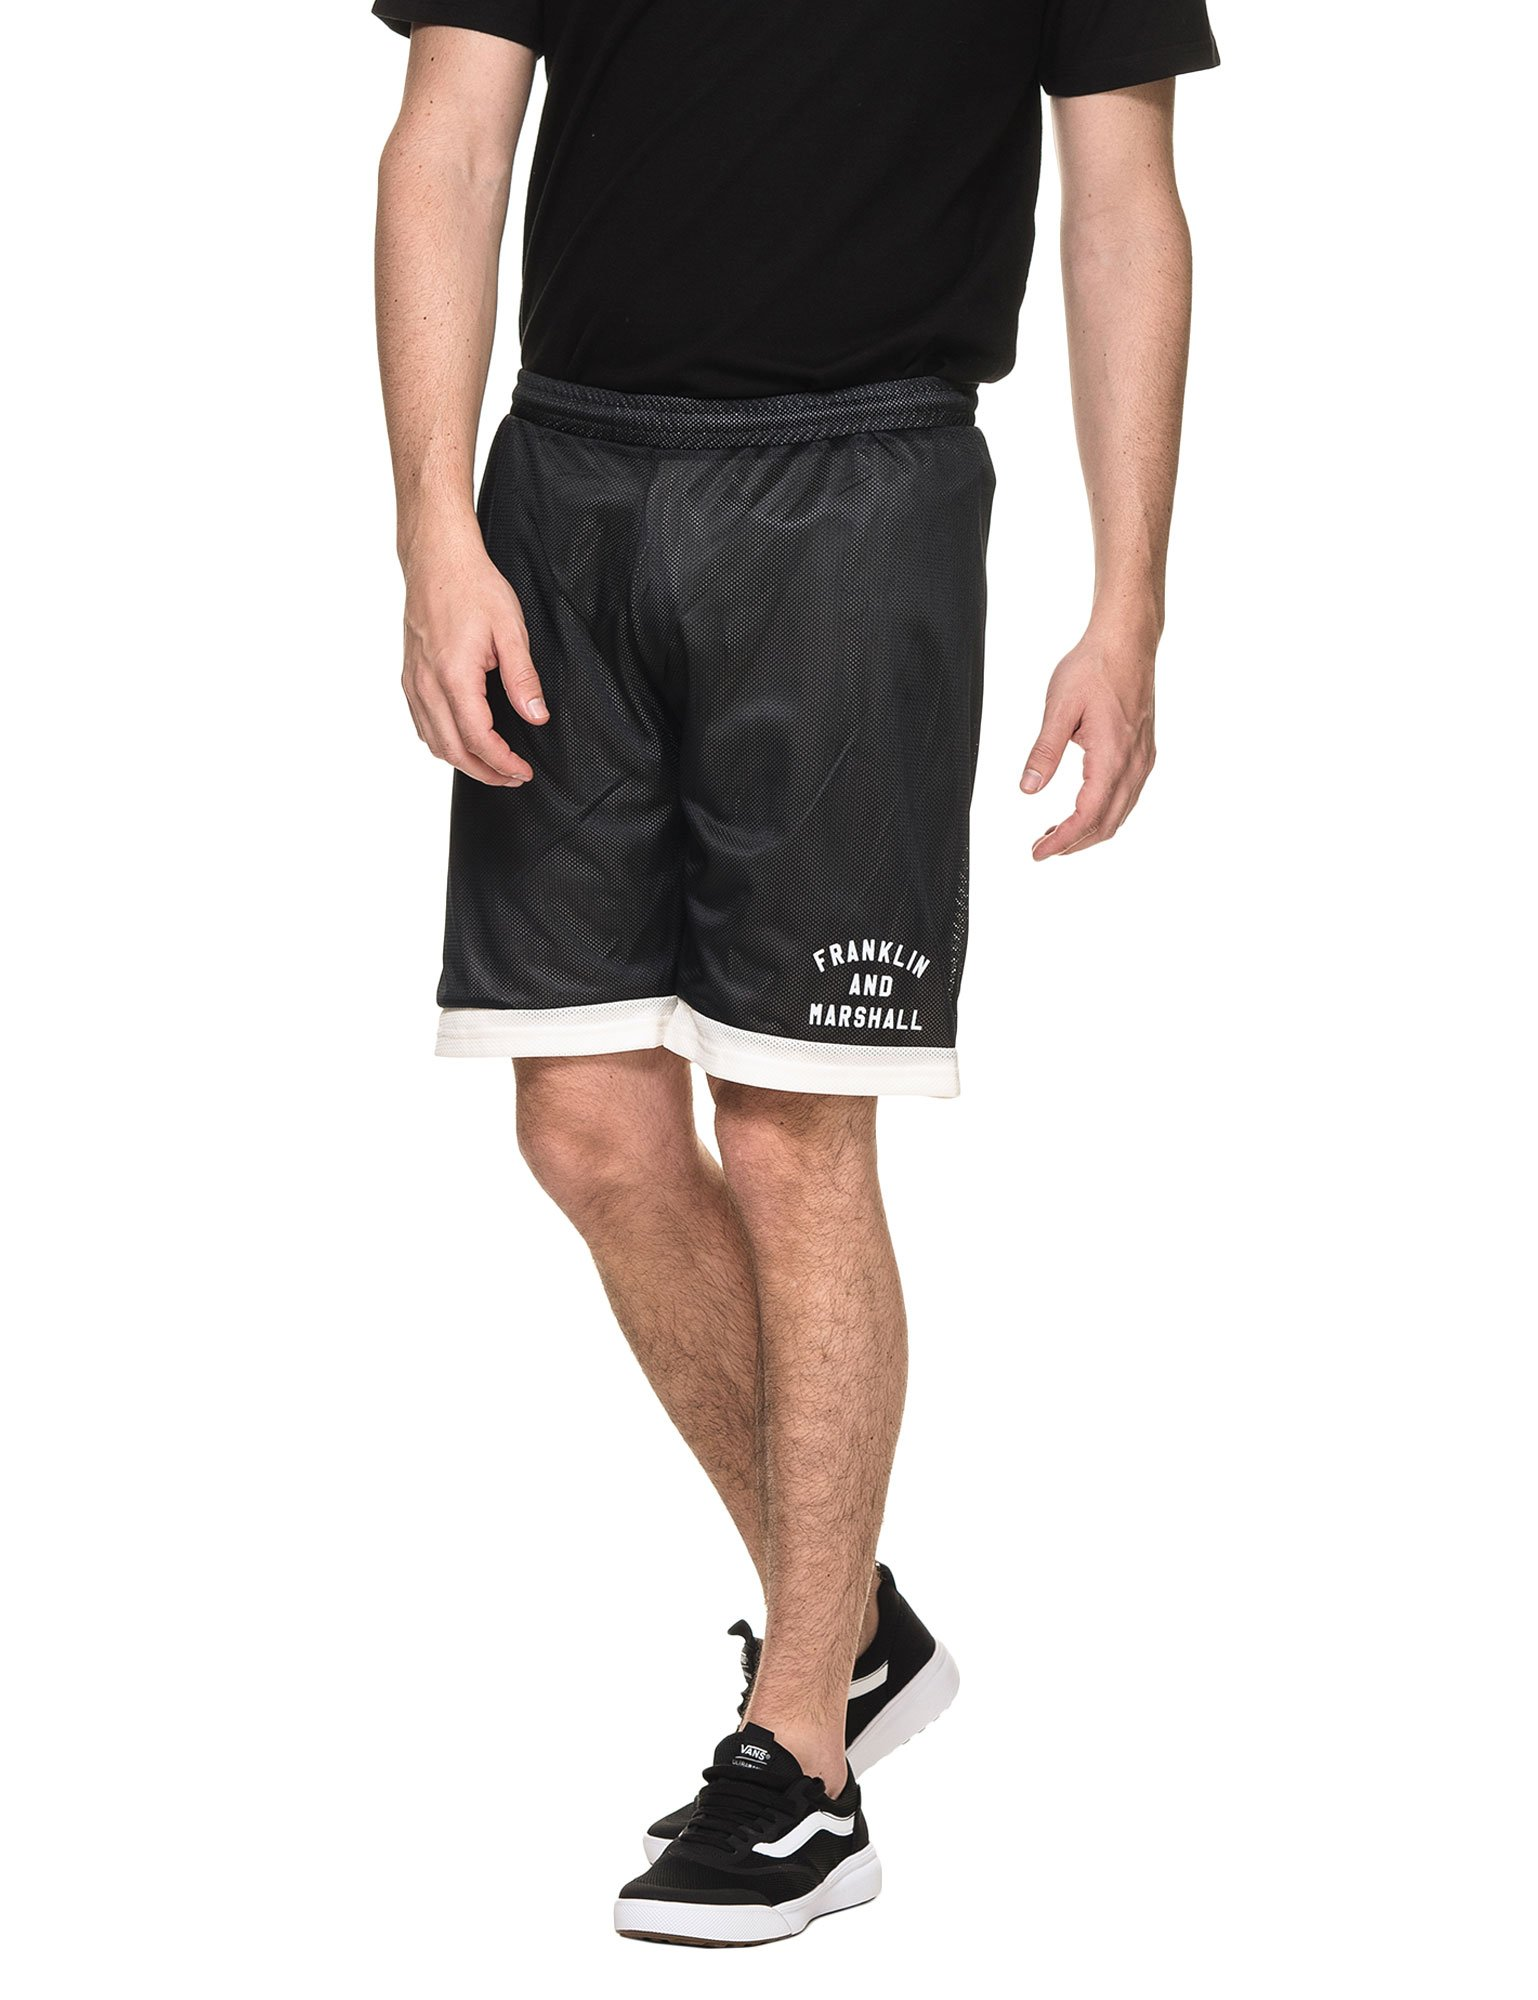 Franklin & Marshall Men's Fleece Uni Shorts Black in Size XL